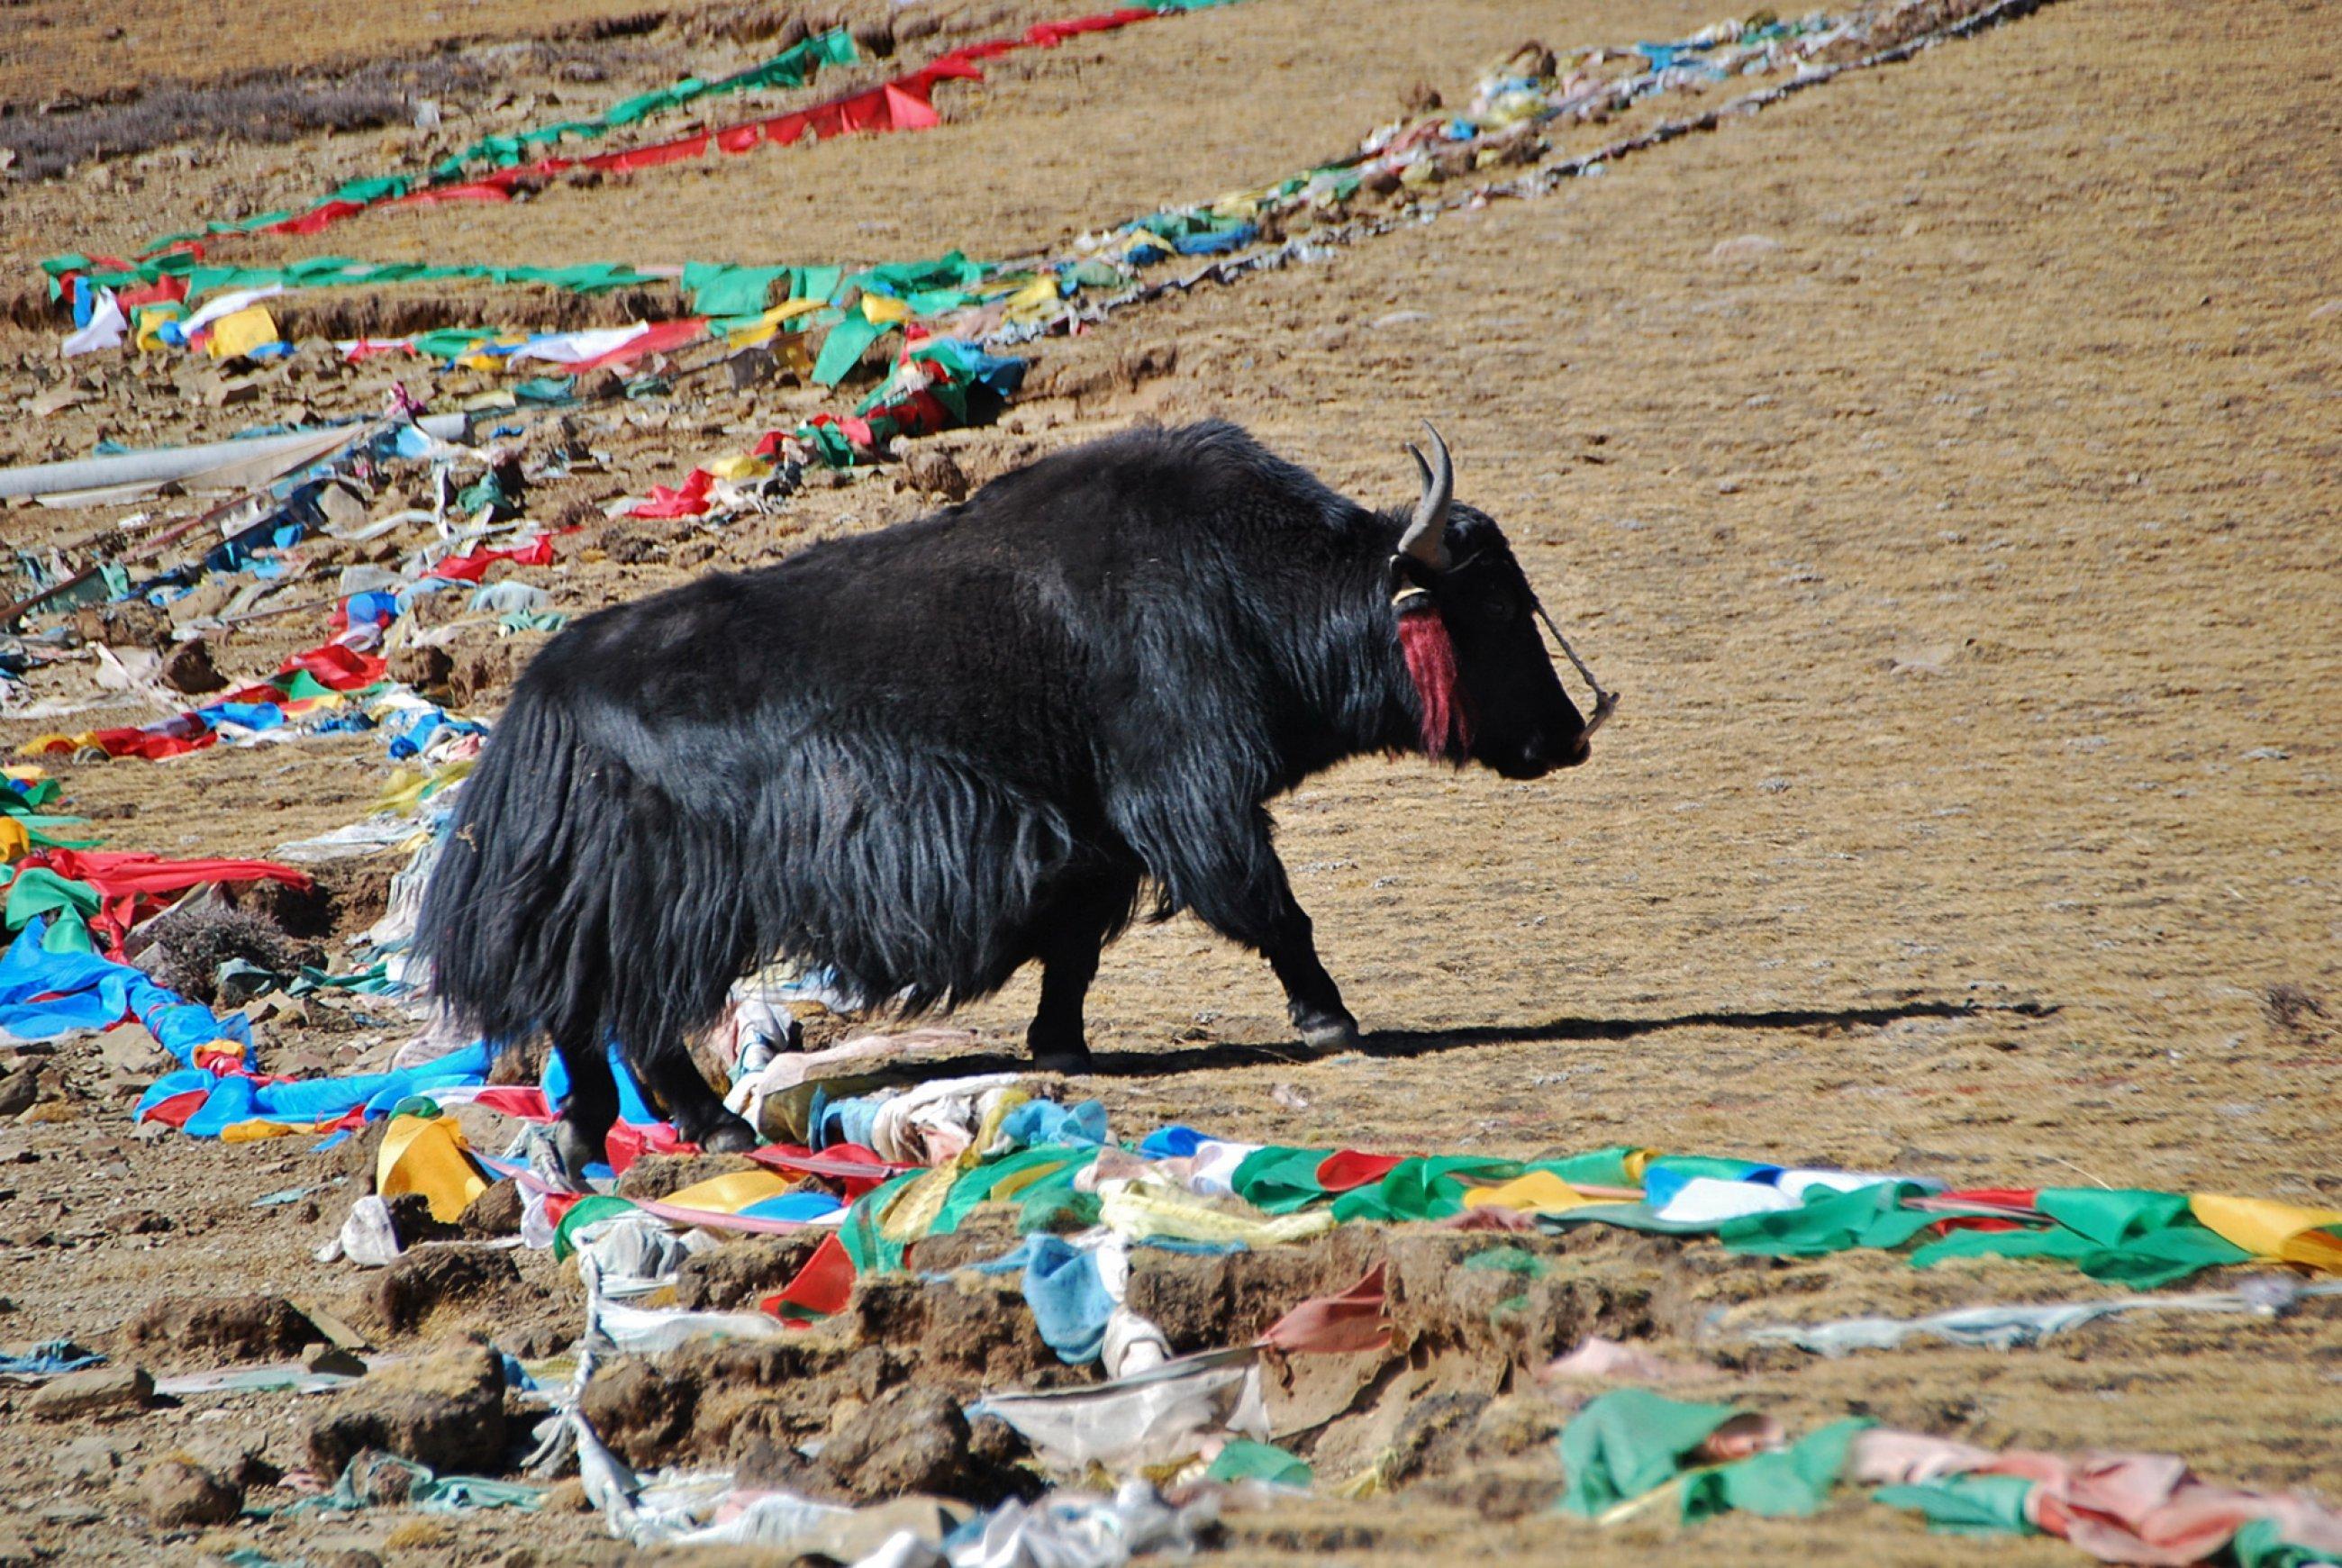 https://bubo.sk/uploads/galleries/16319/tibet-yamdrok-ctni-11-2014-mirka-sulka-218-.jpg